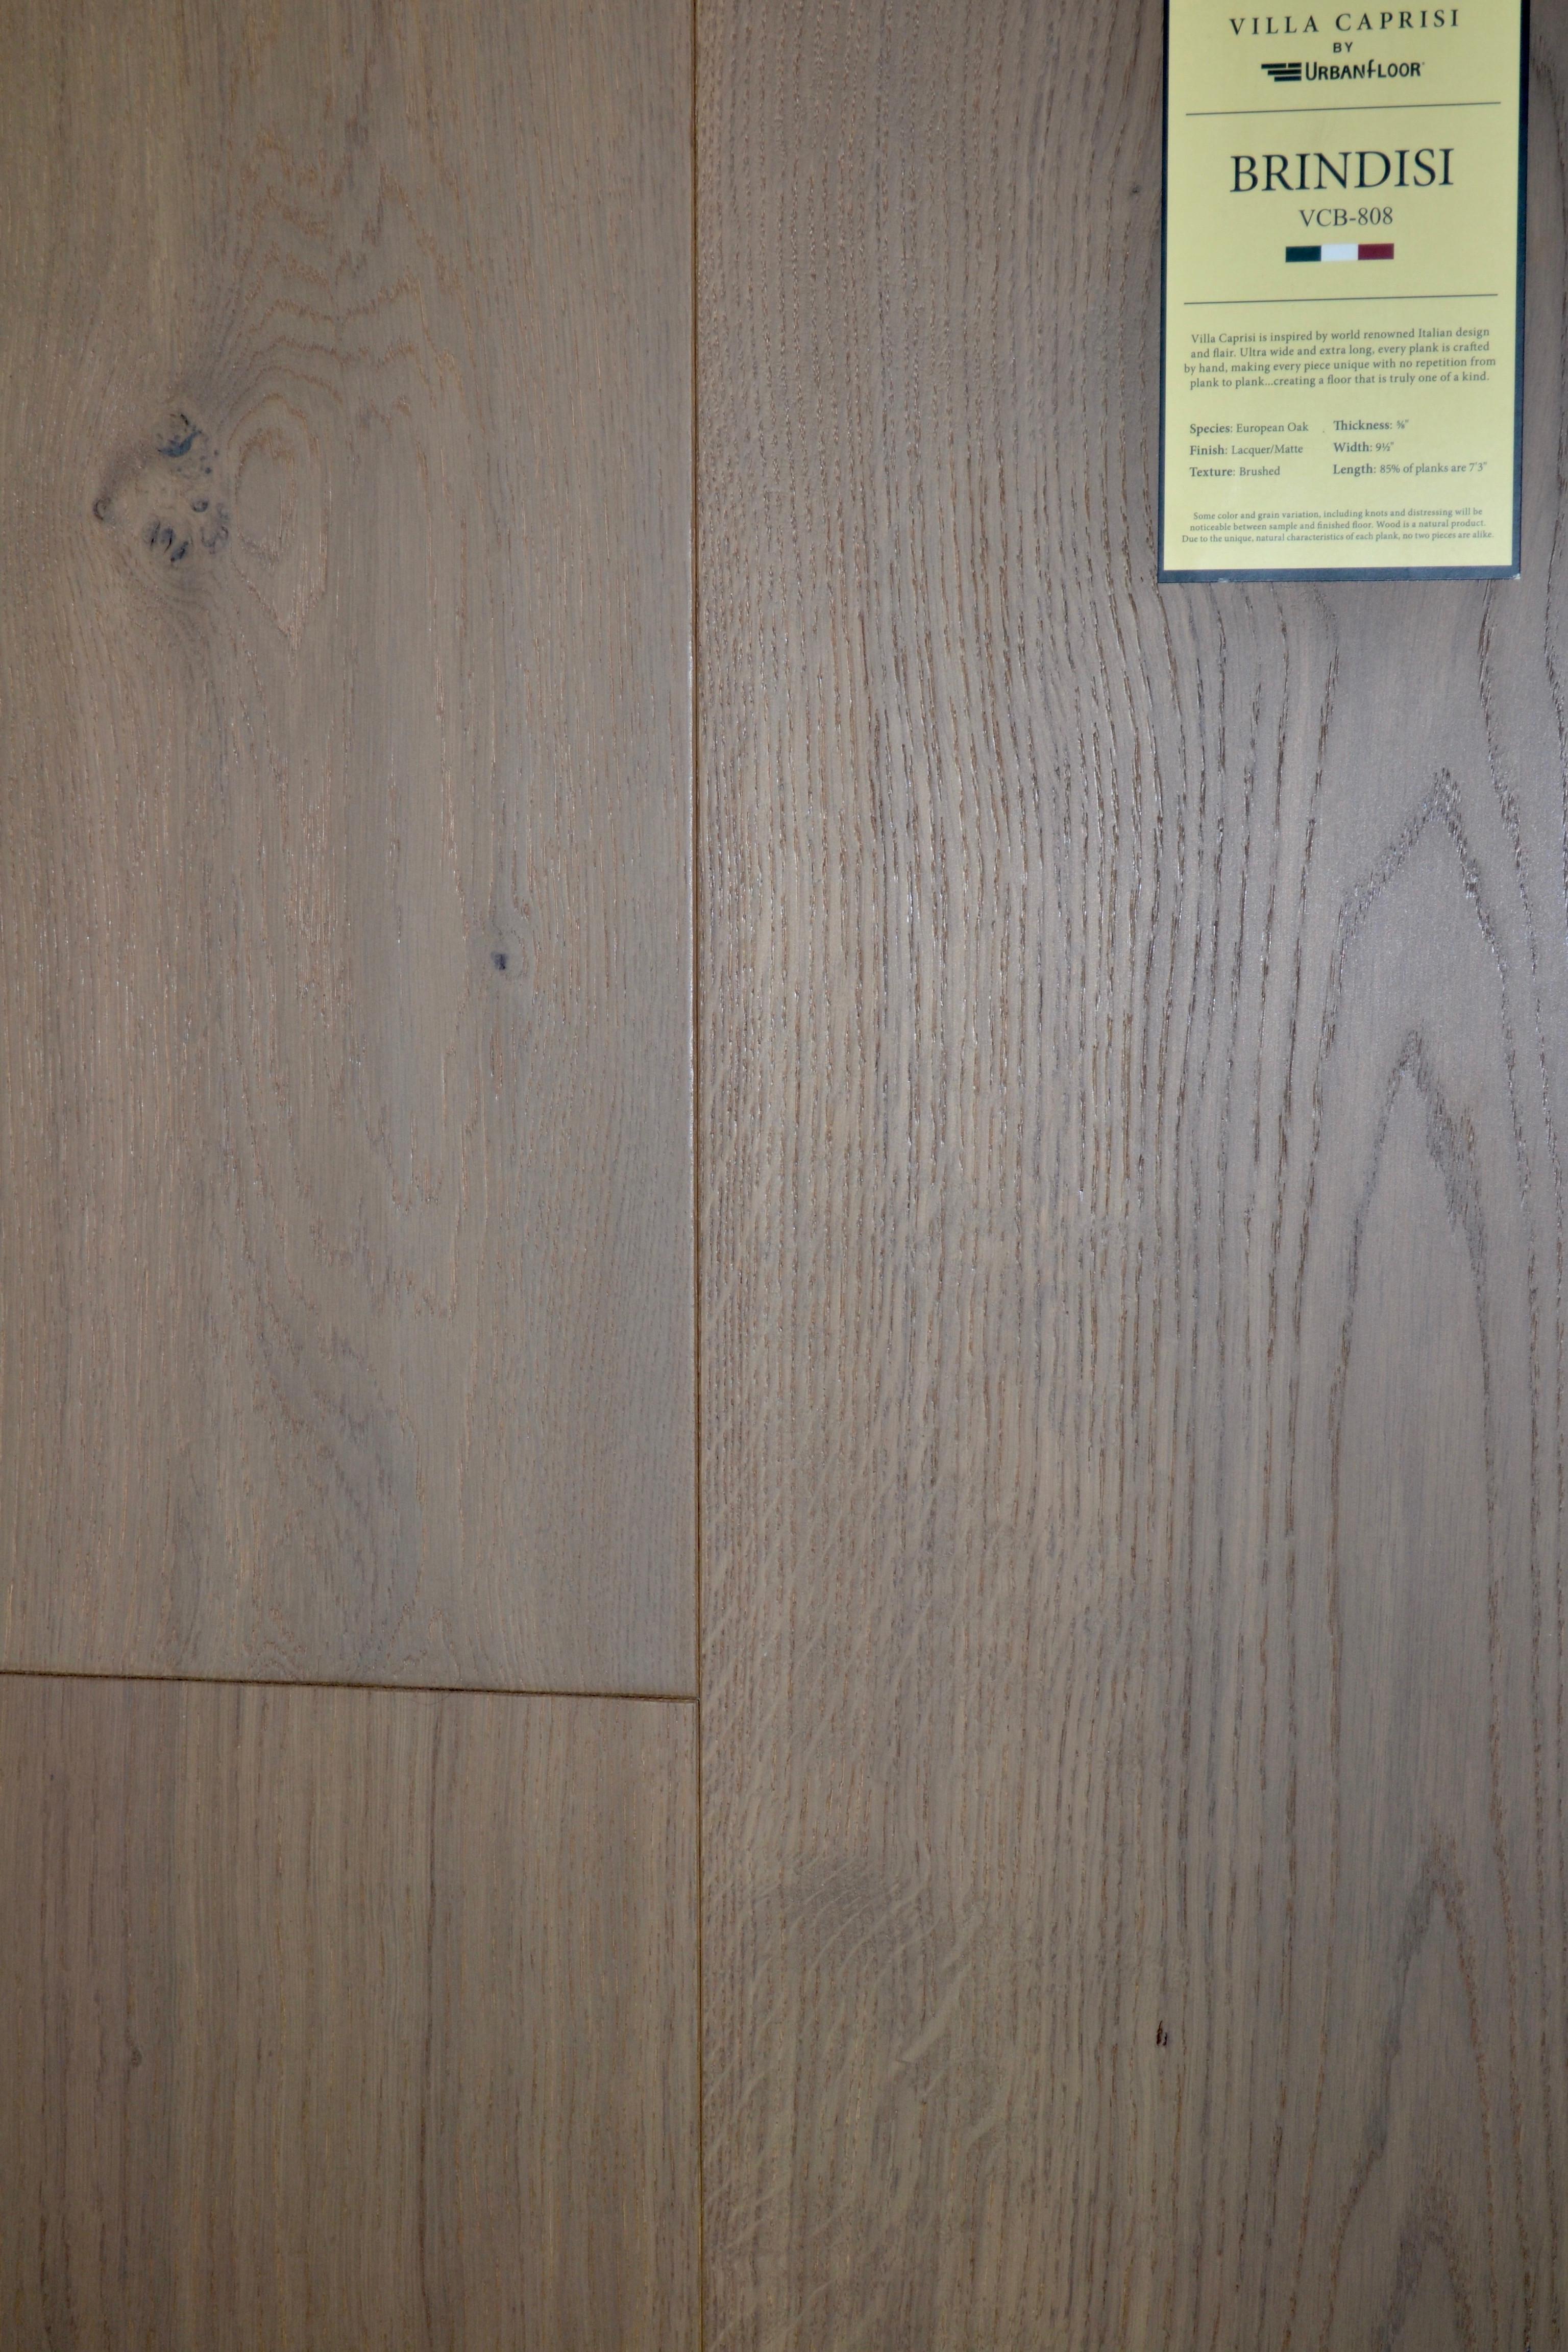 exotic hardwood flooring manufacturers of villa caprisi fine european hardwood millennium hardwood within european style inspired designer oak floor brindisi by villa caprisi